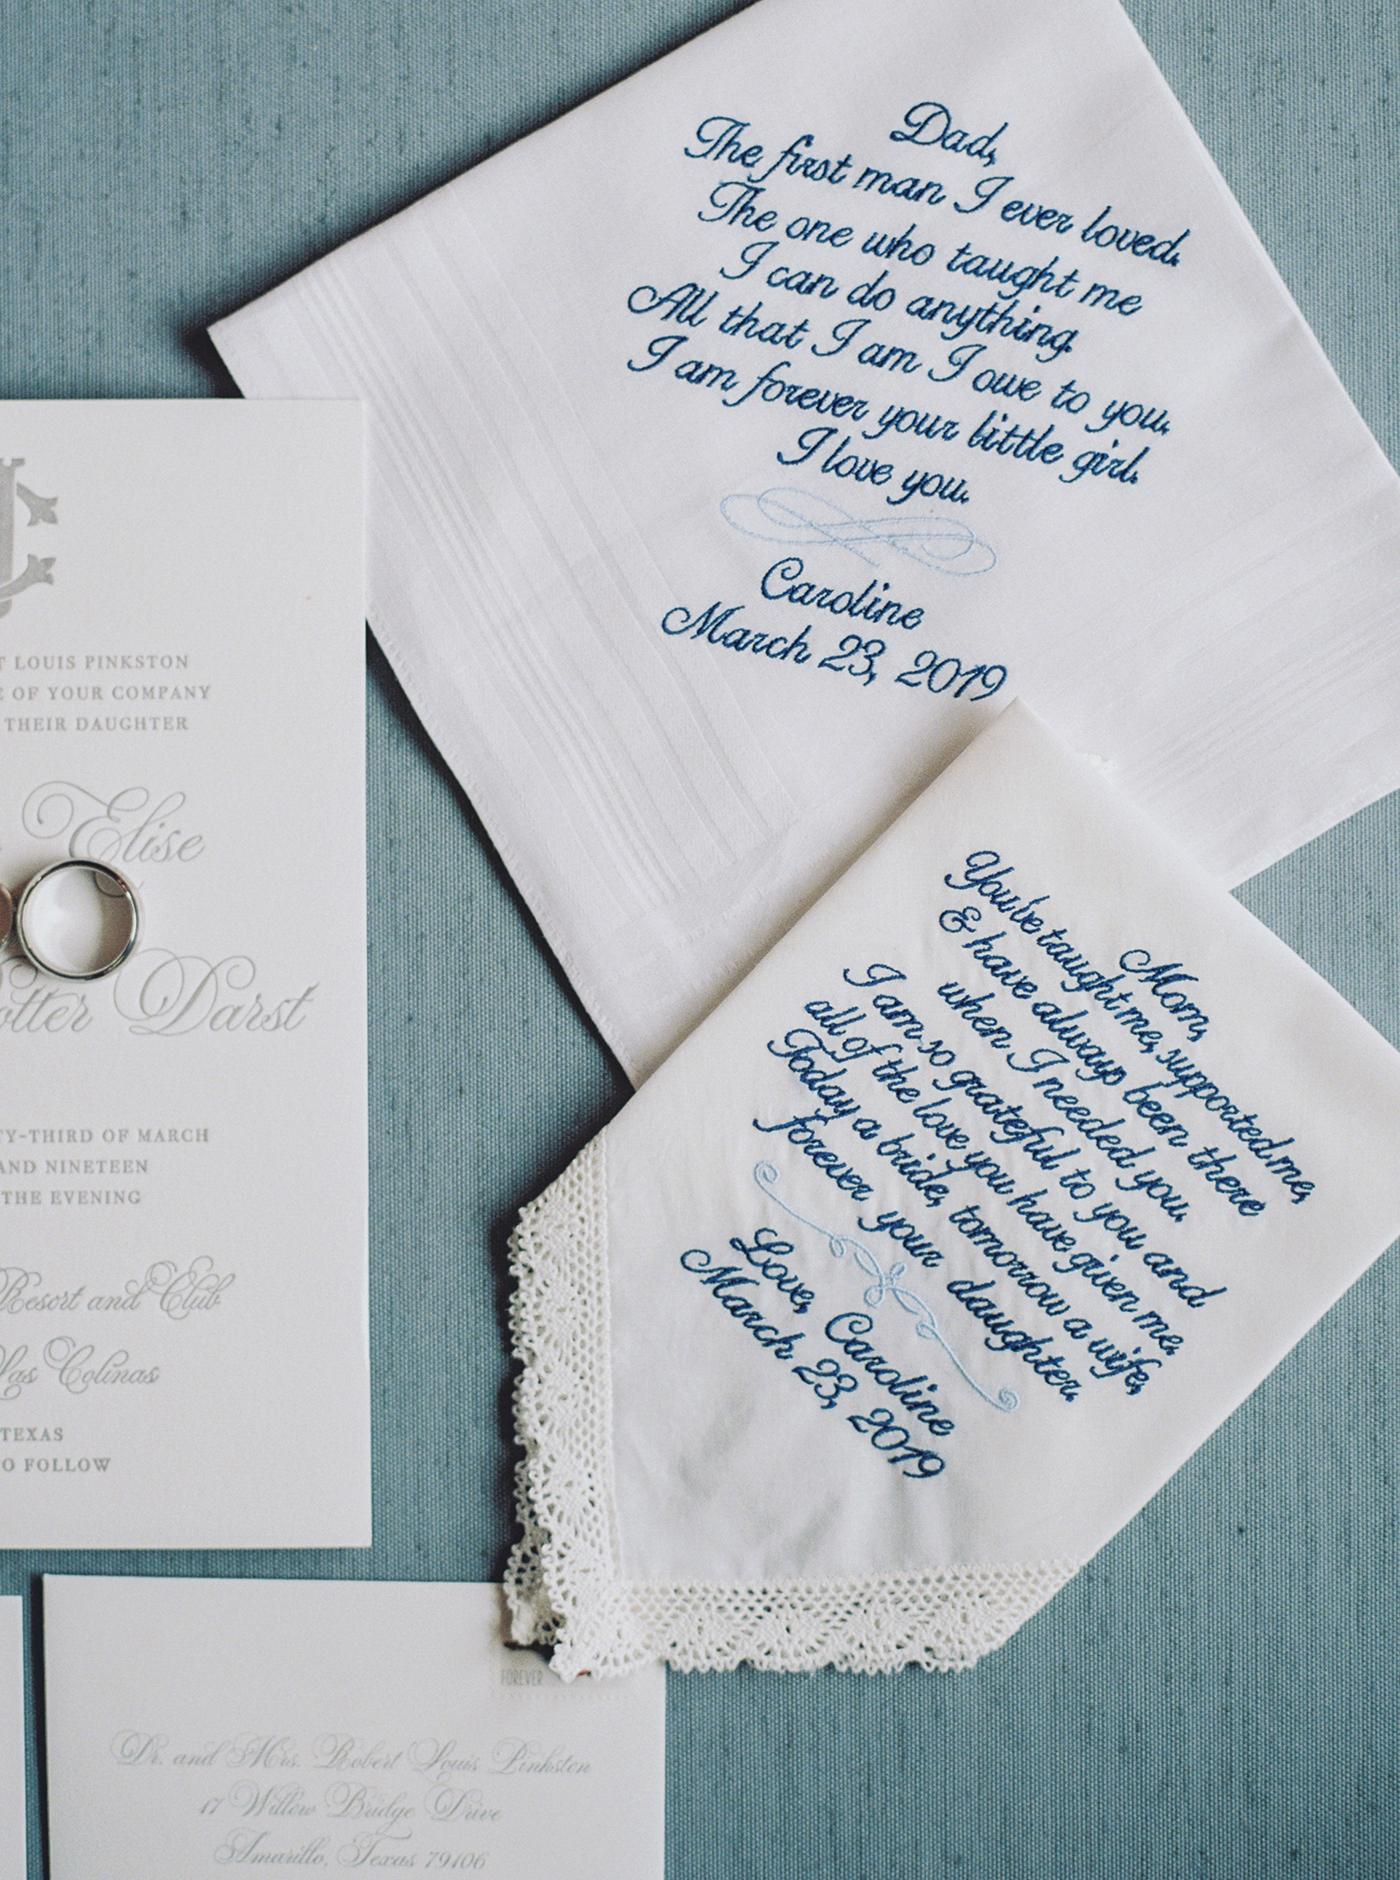 DFW Wedding Planner - Caroline + Jeff at The Four Seasons Hotel Wedding - Allday Events - 4.jpg